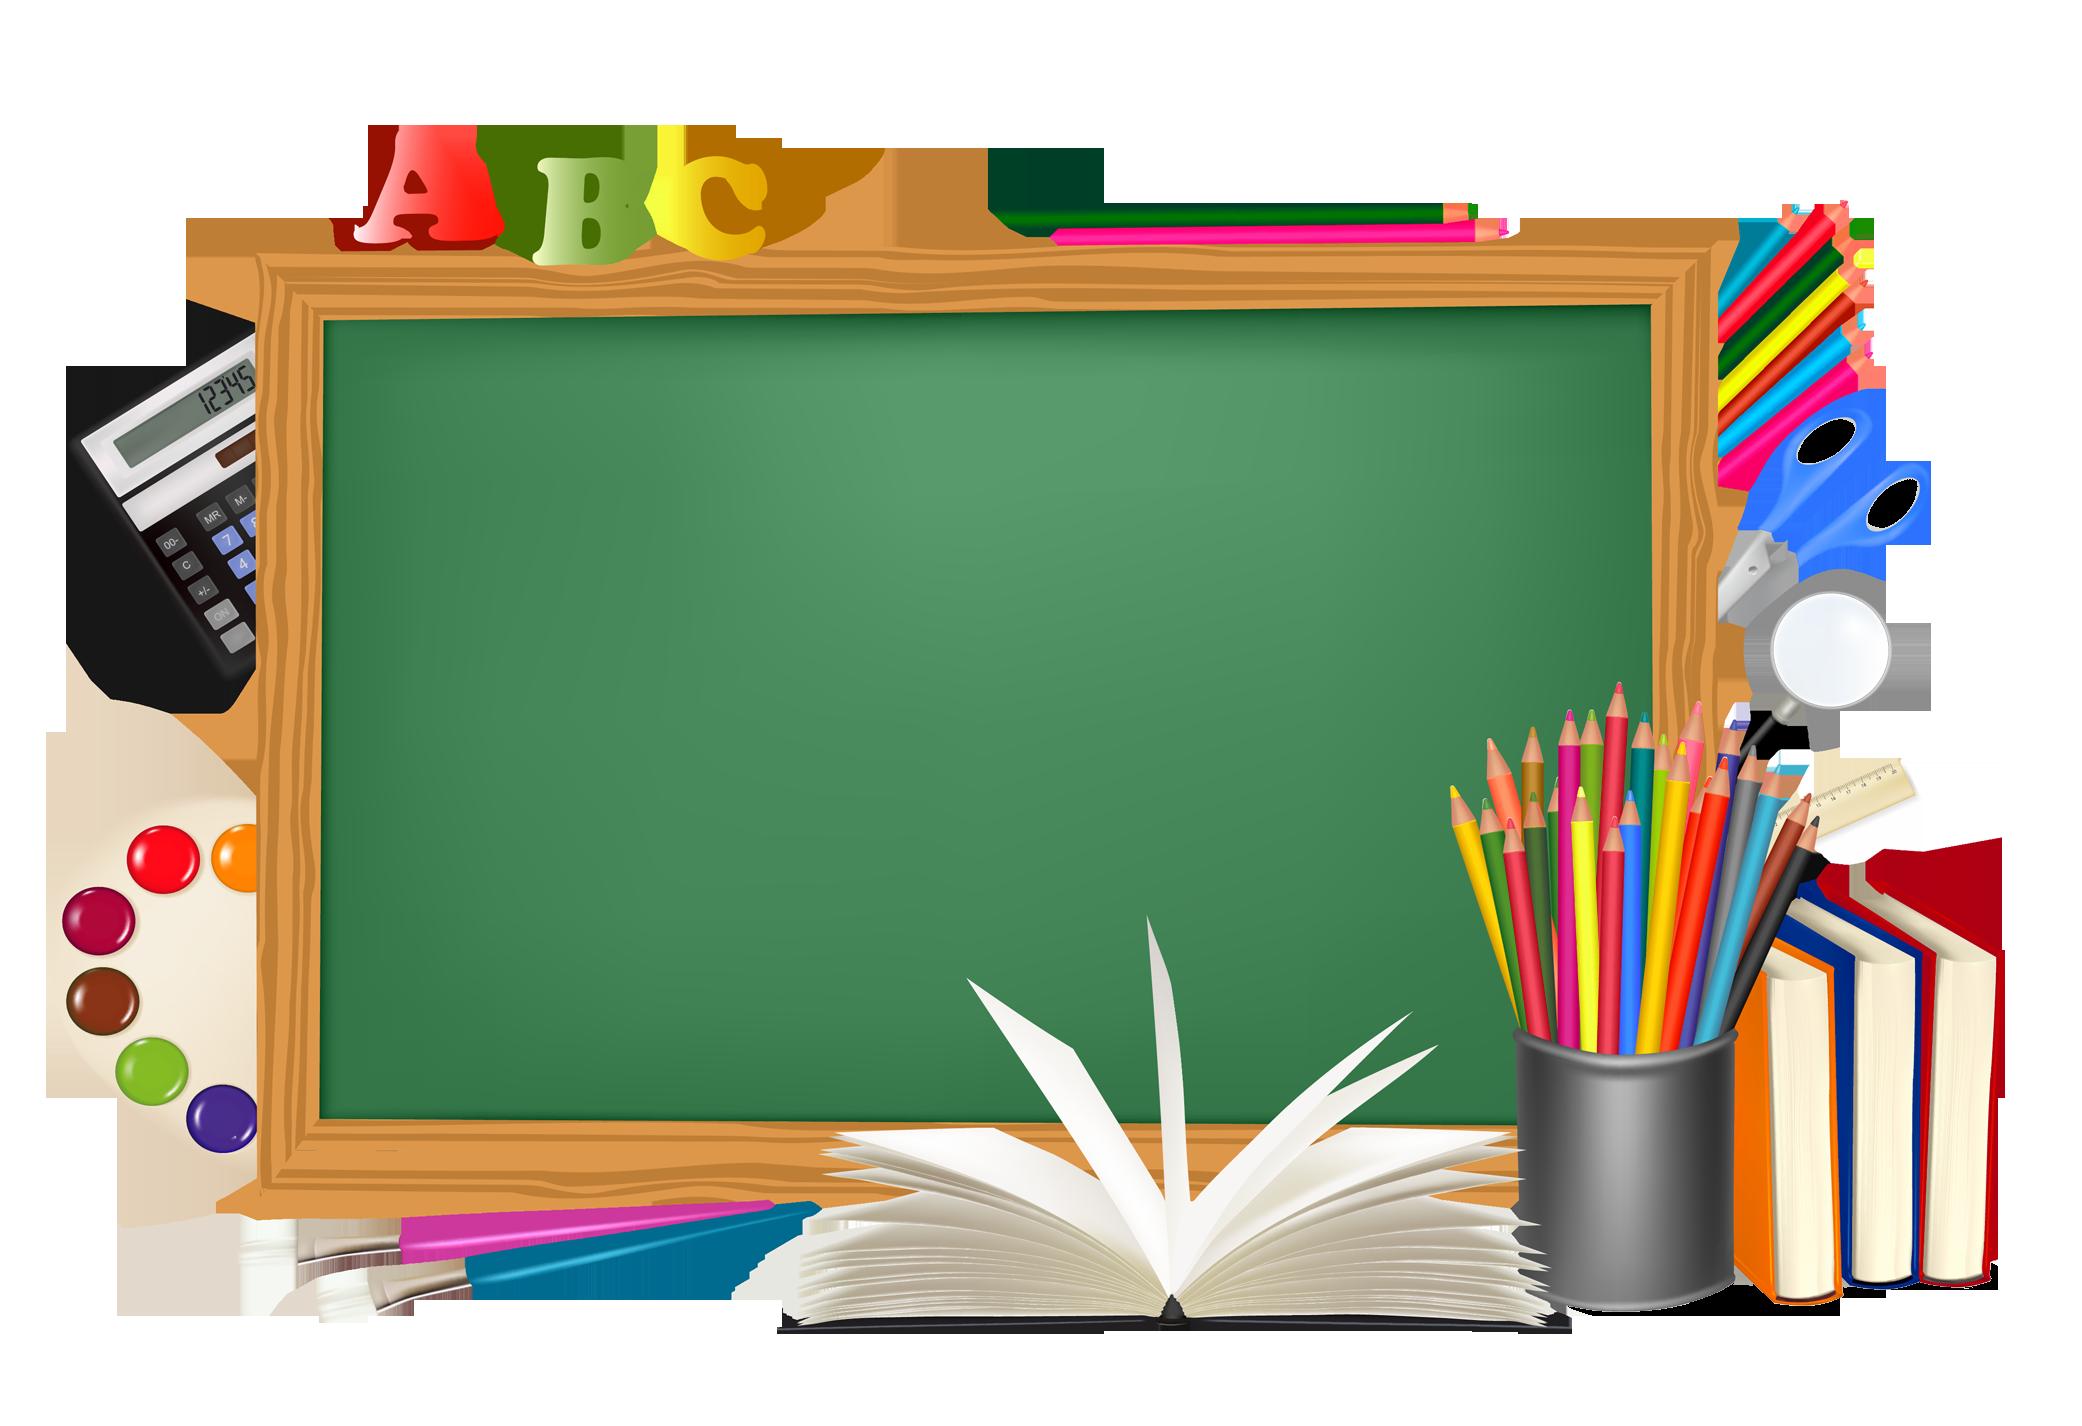 Fundo escolar clipart jpg library stock Pin de Eynasoo em ✪ Clipart ✪ | Quadro escolar, Idéias de escola e ... jpg library stock